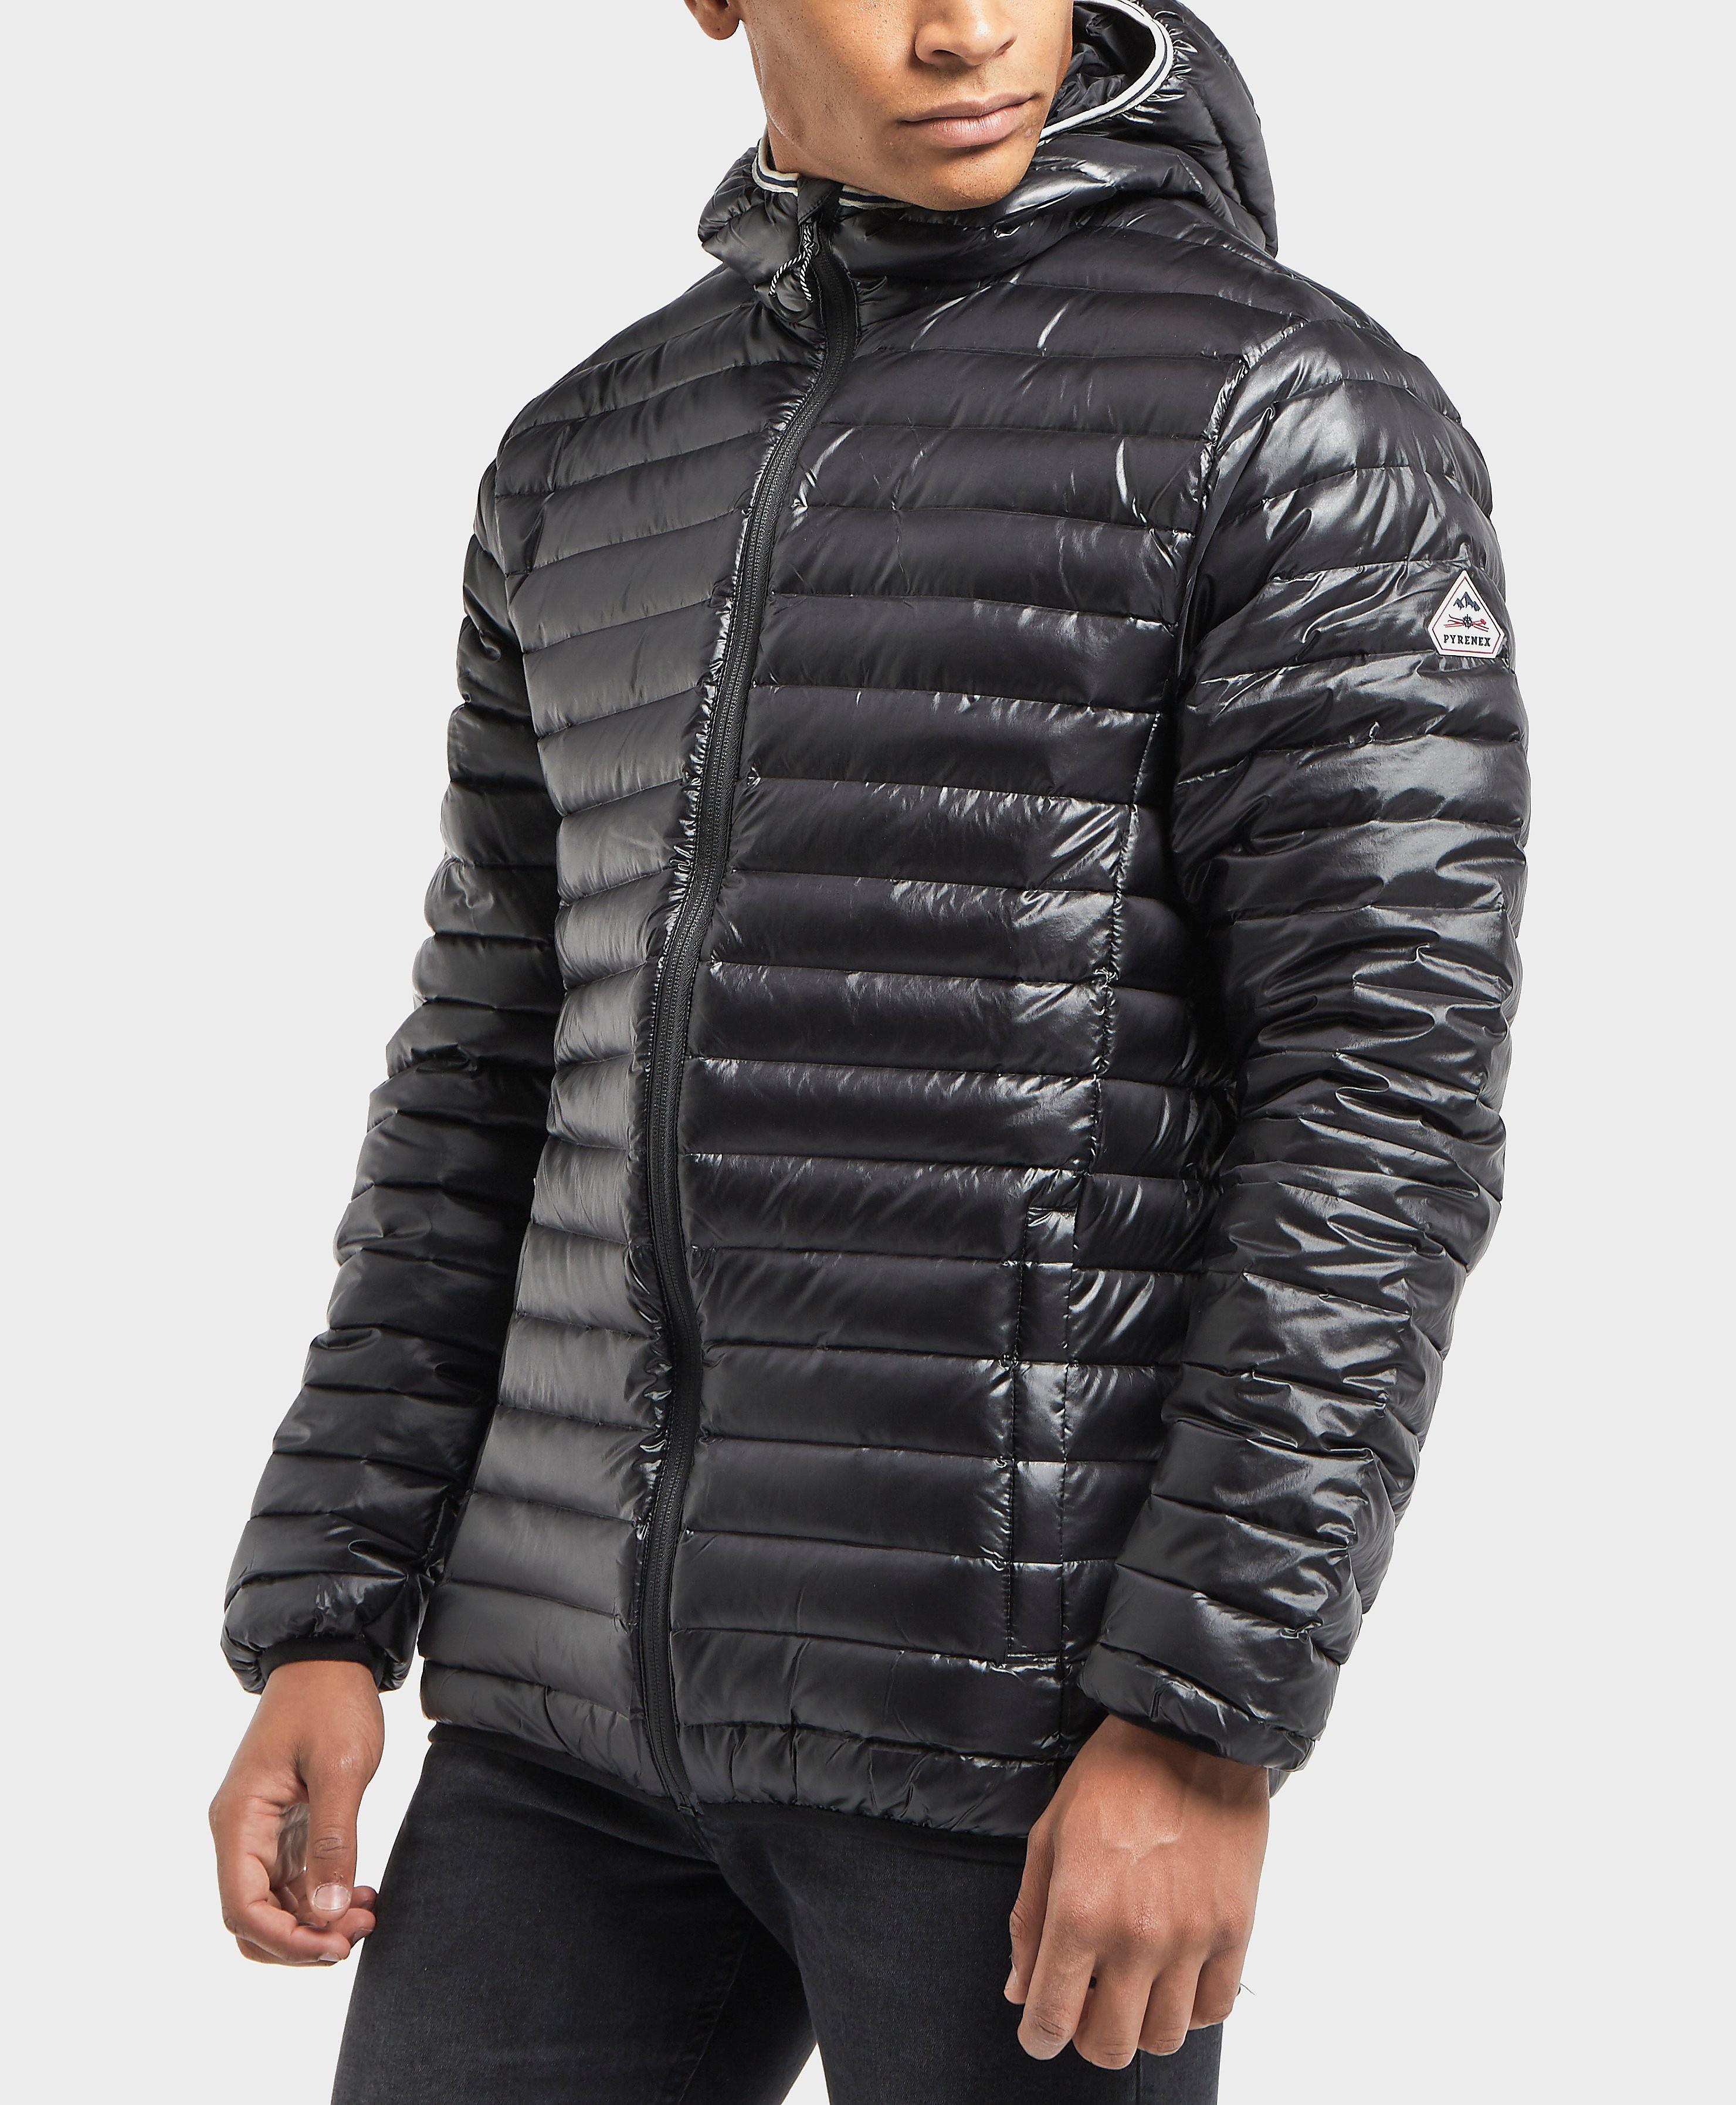 Pyrenex Bruce Lightweight Jacket